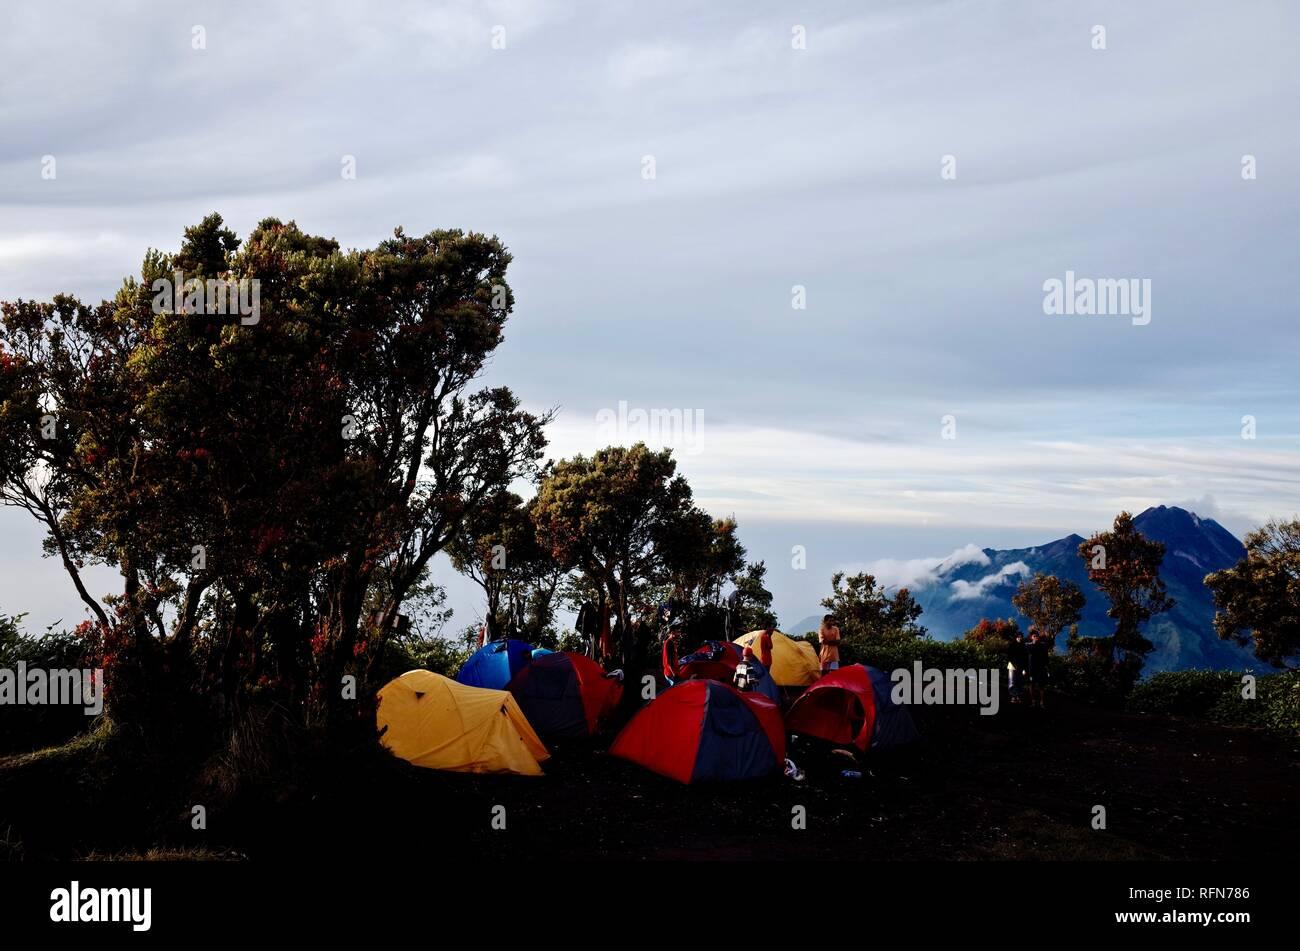 Double Summit Mount Merapi and Mount Merbabu experience - Stock Image